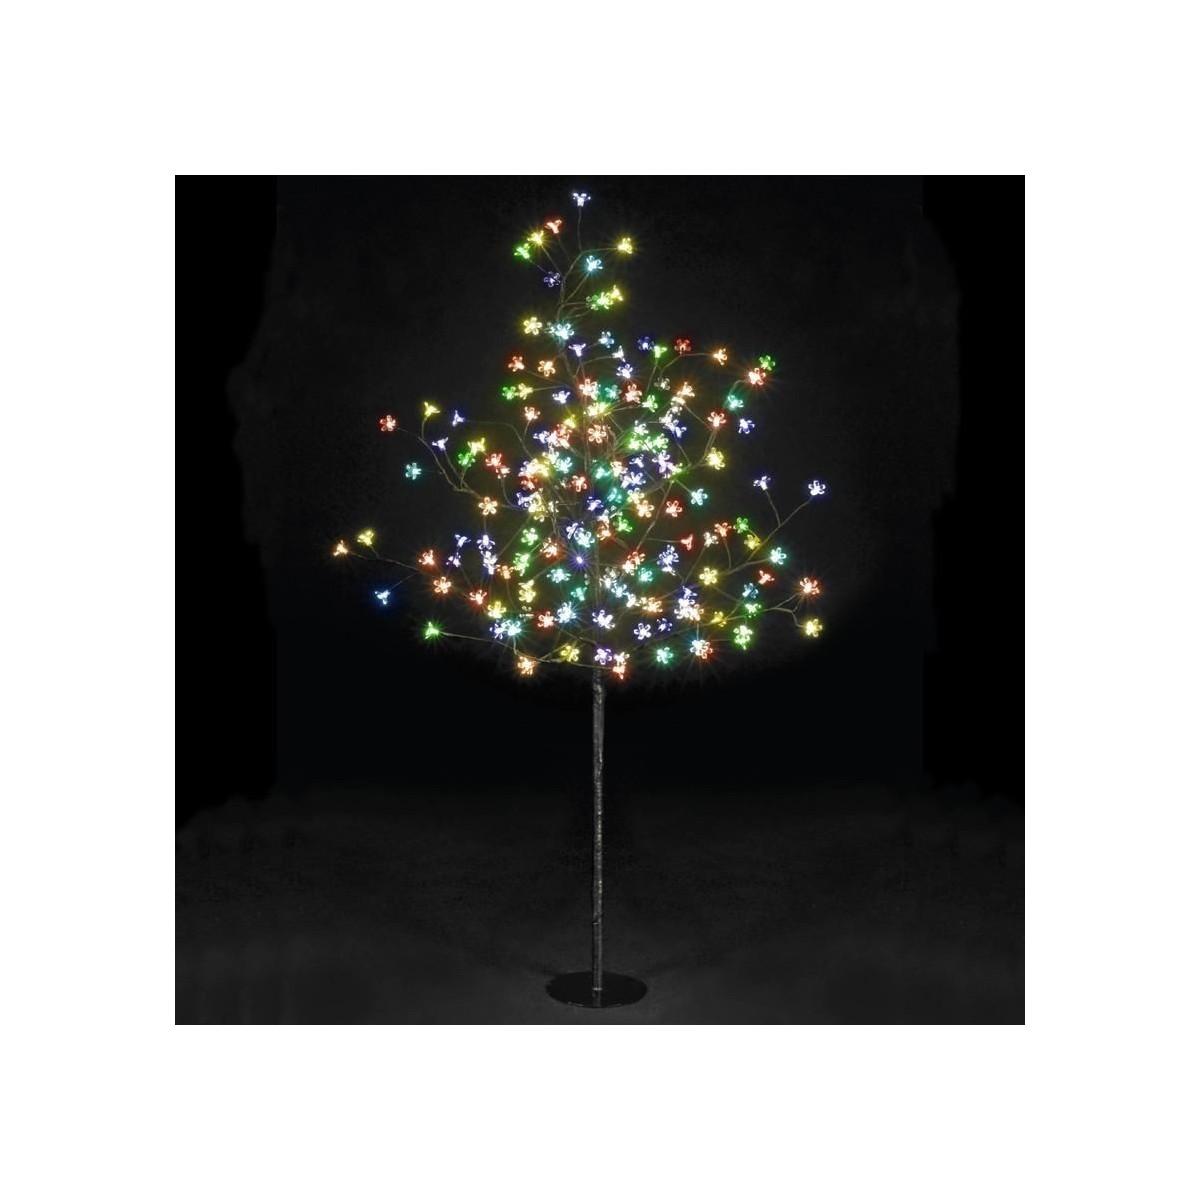 150cm/5ft Outdoor Cherry Blossom Tree - 150 Multi-colour LED Lights